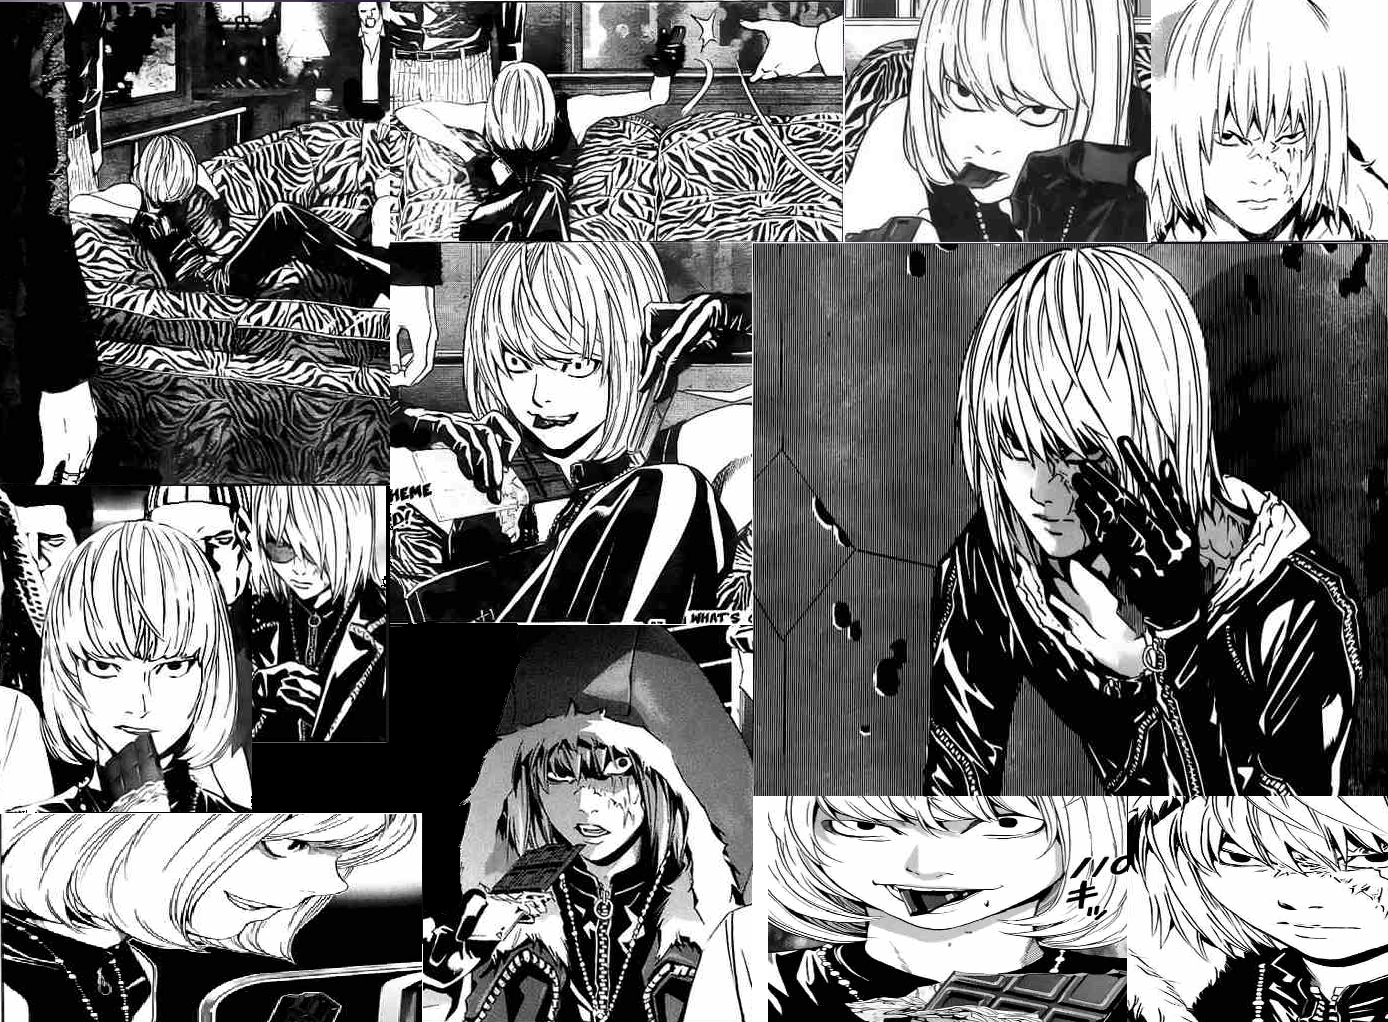 Mello Manga Collage - Mello Fan Art (14351265) - Fanpop